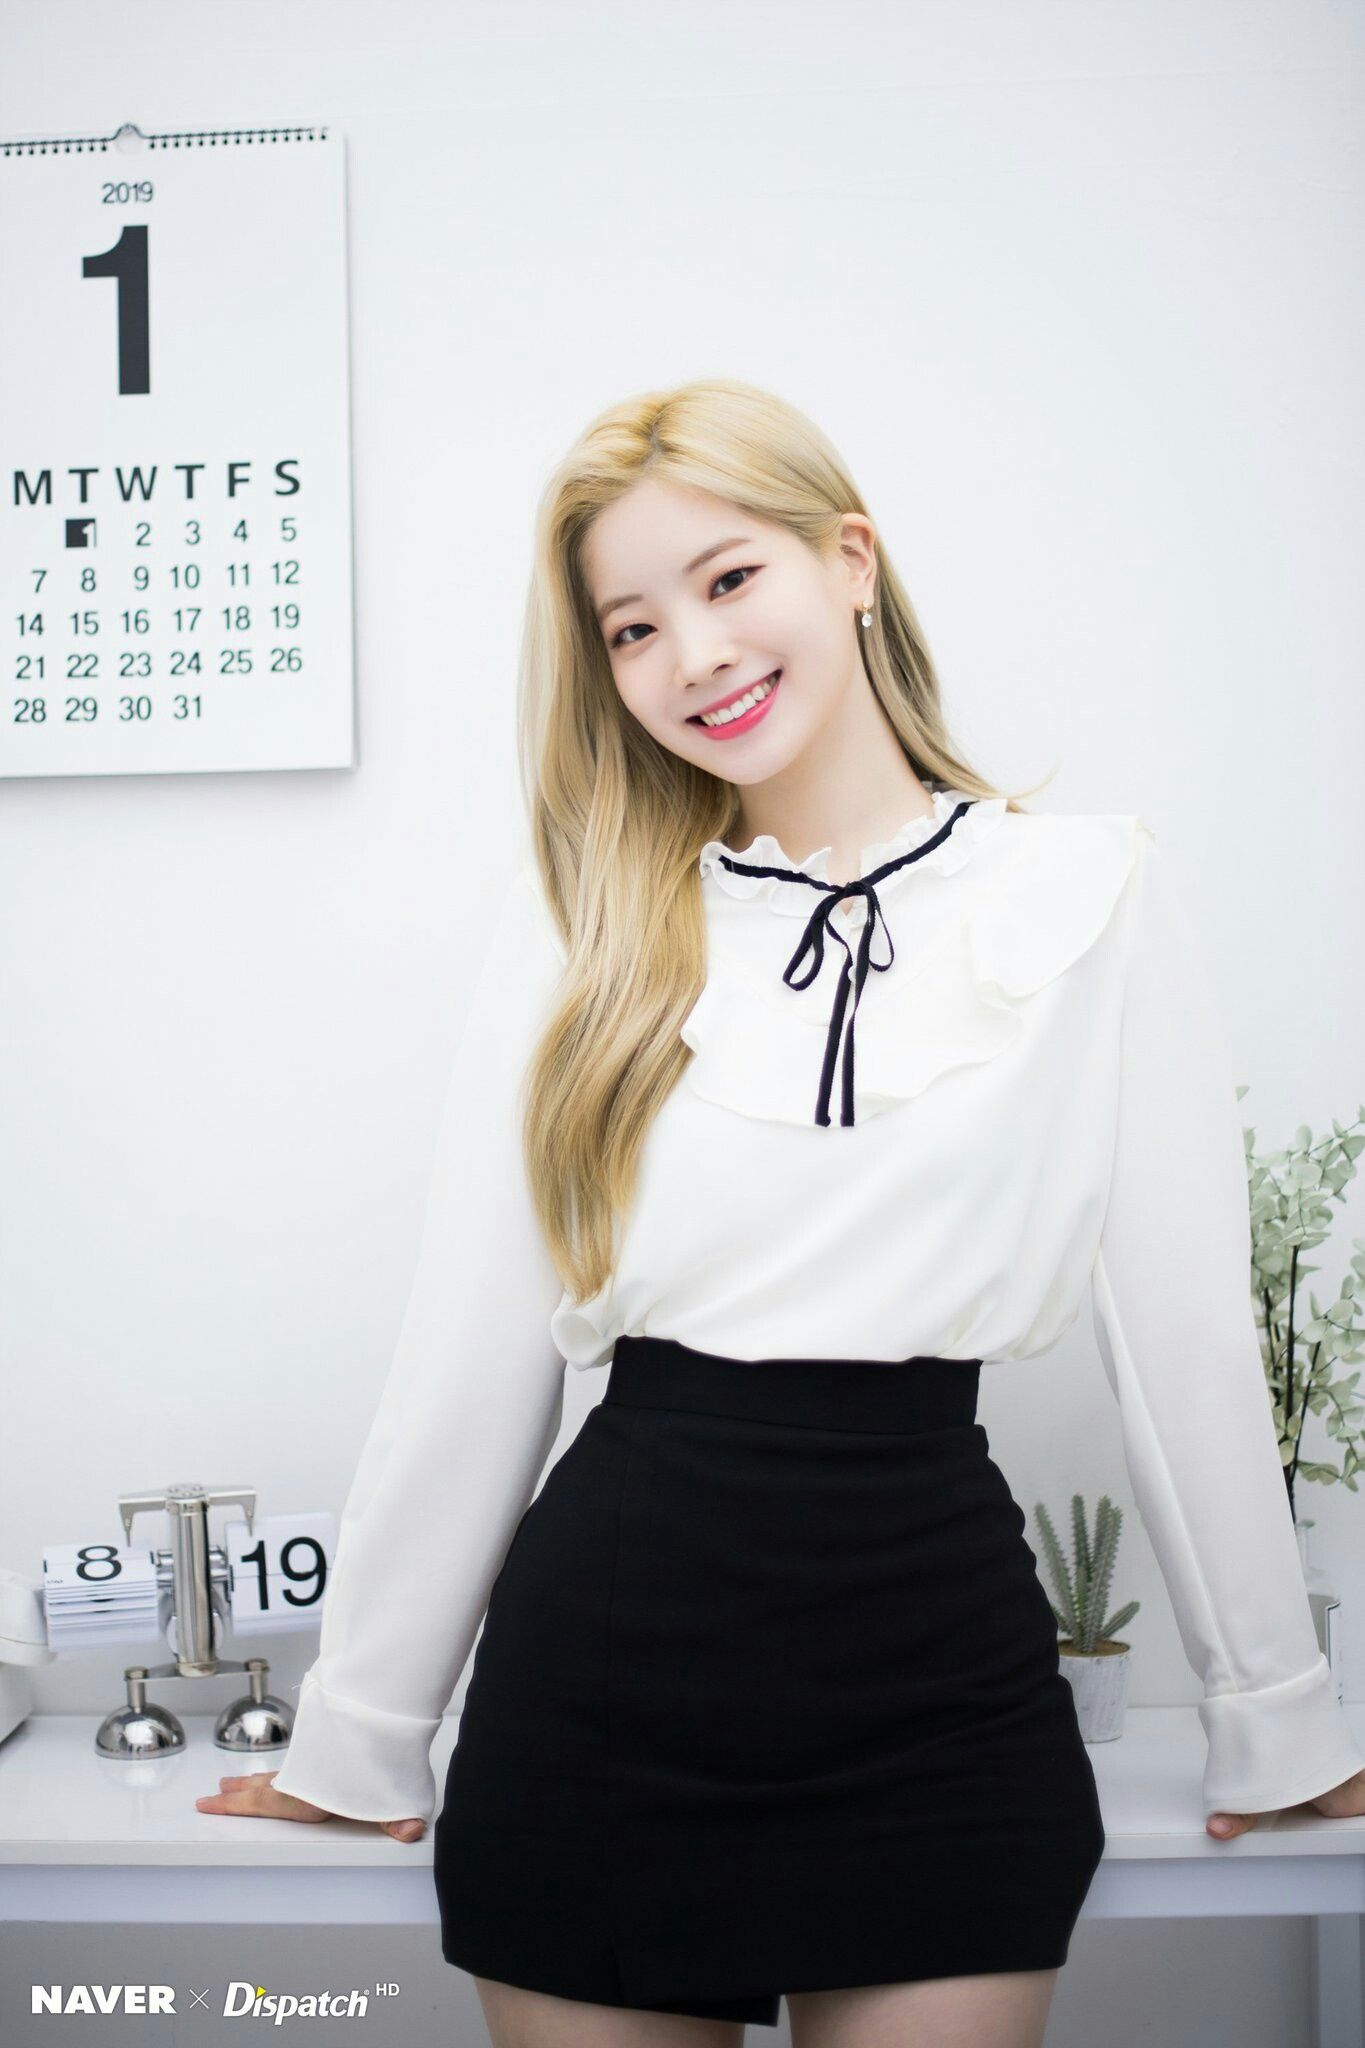 Body Goals Udah Cocok Iih Main Di Drama Pleaseee Dubu Di Panggil Untuk Jadi Pemeran Utama Kpop Girls Twice Dahyun Girl